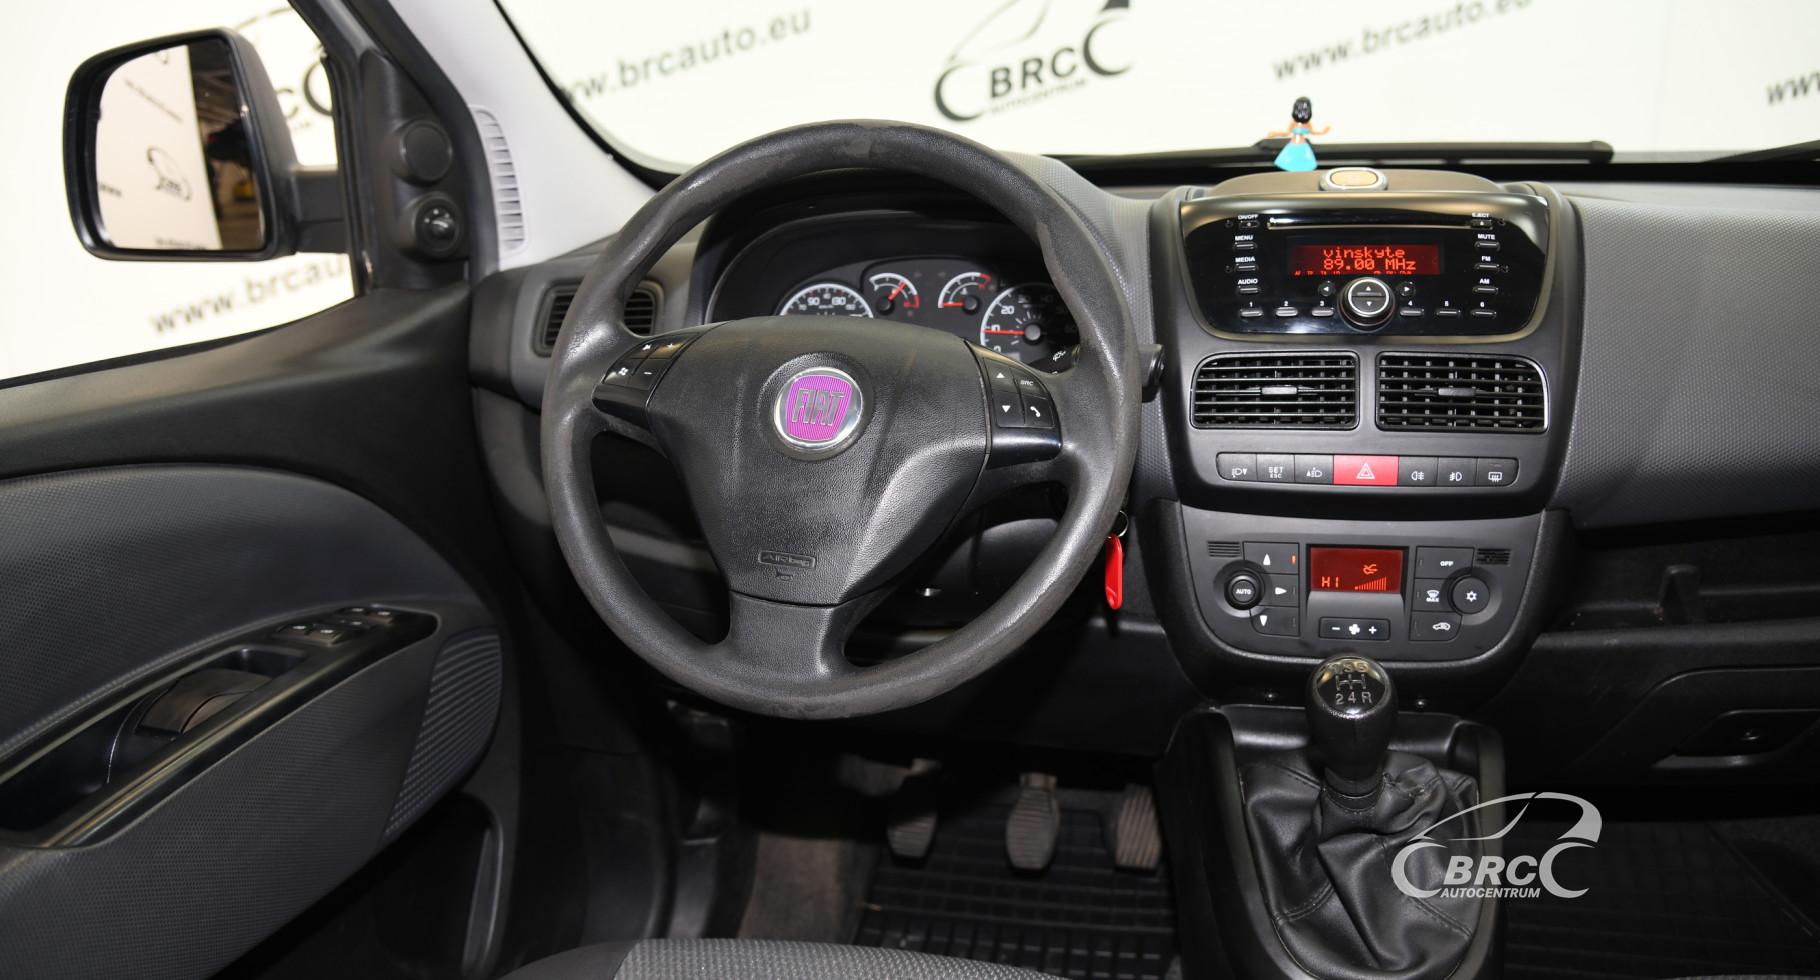 Fiat Doblo 1.3 Multi Jet 90